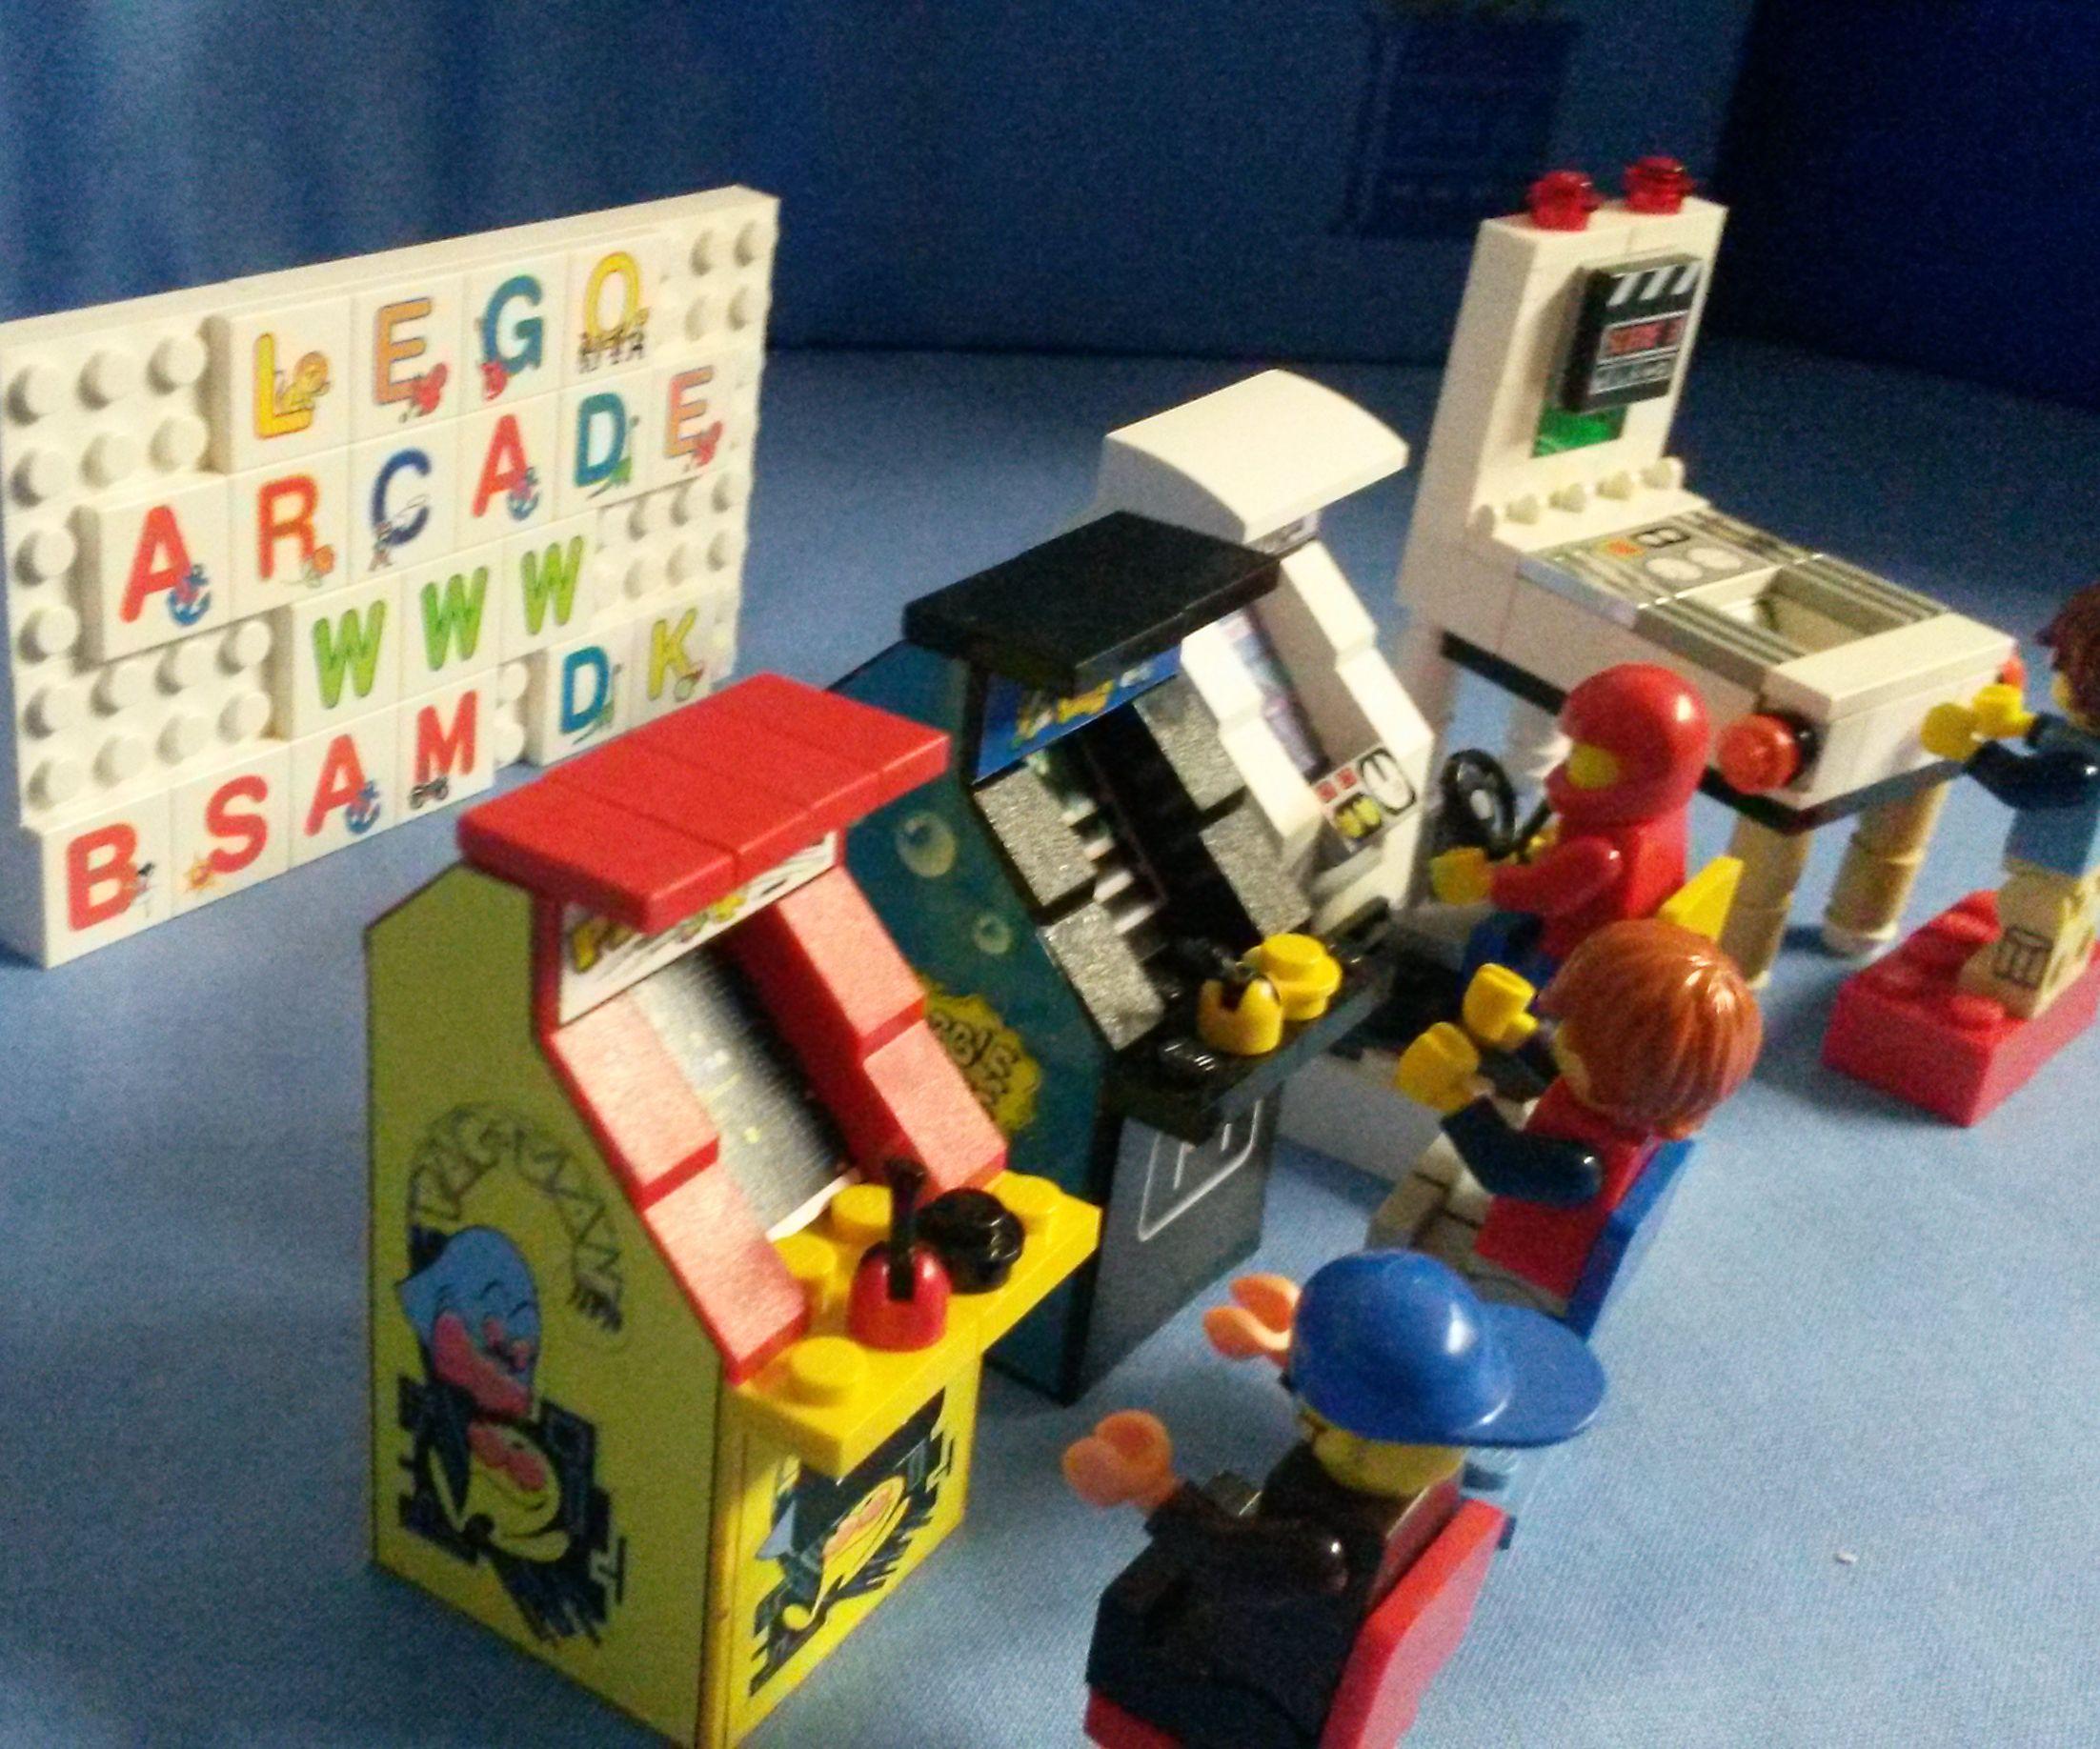 Lego arcade game room